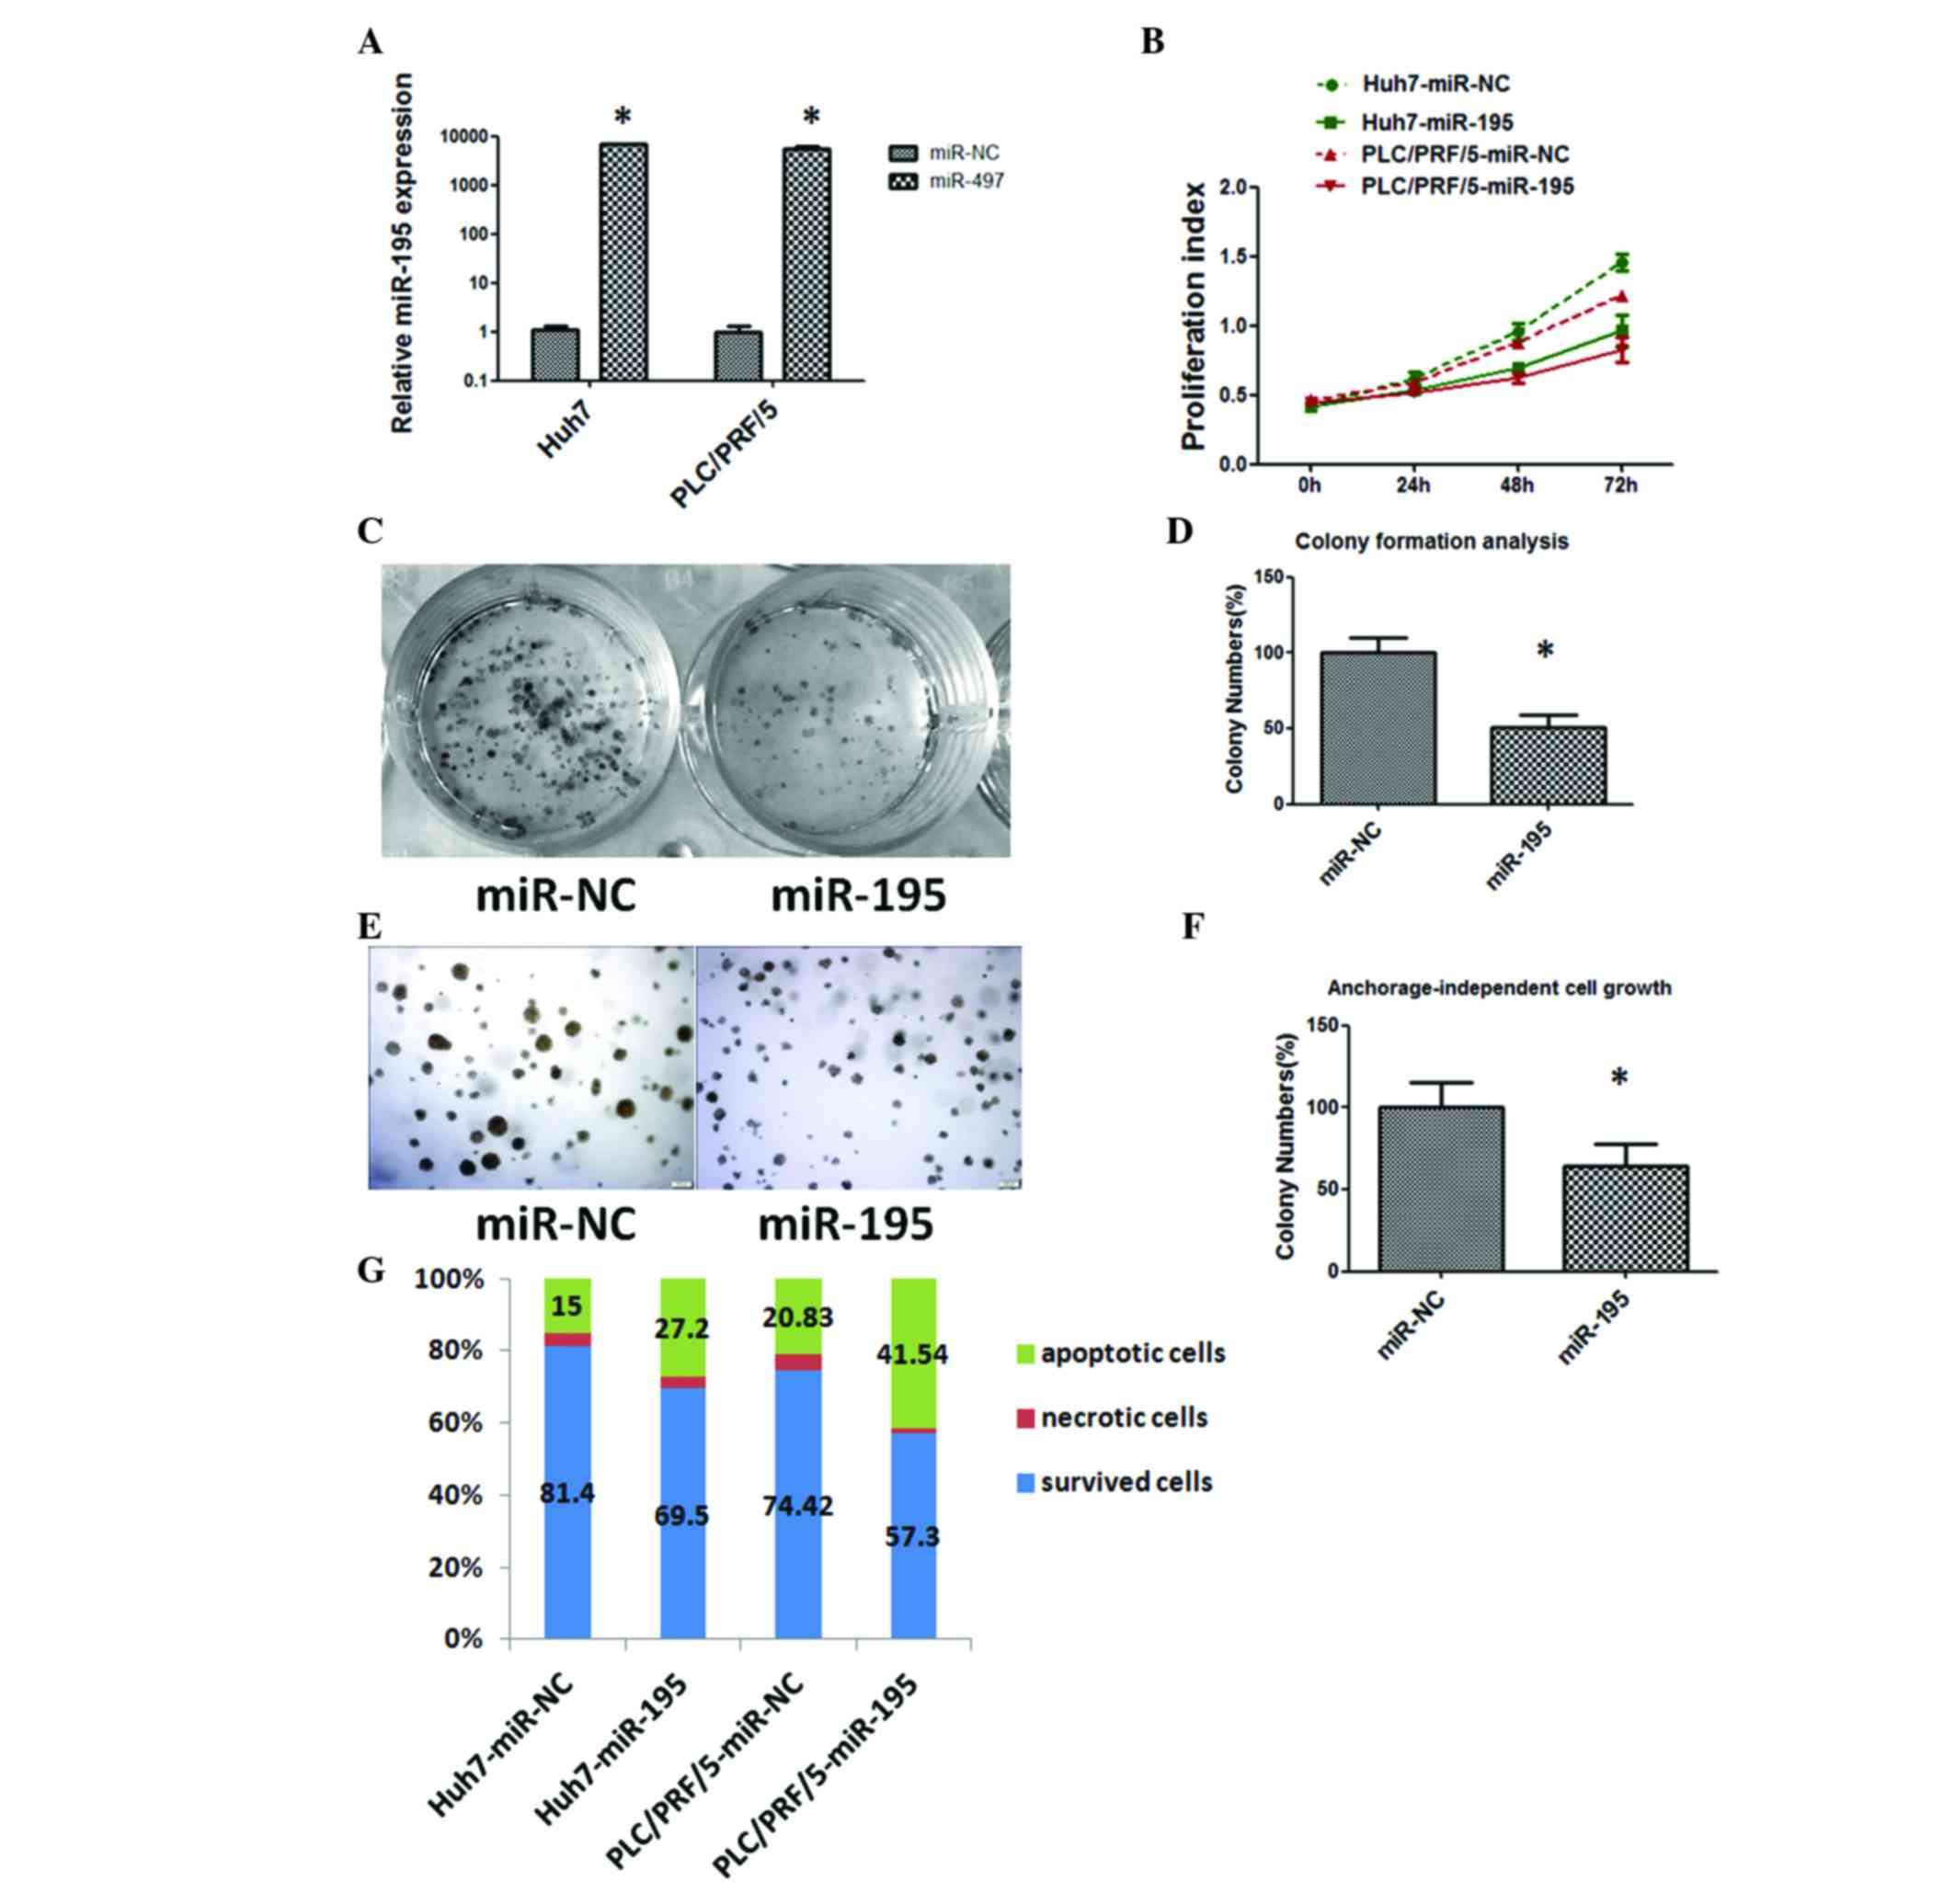 MiR-195 inhibits cell proliferation via targeting AEG-1 in